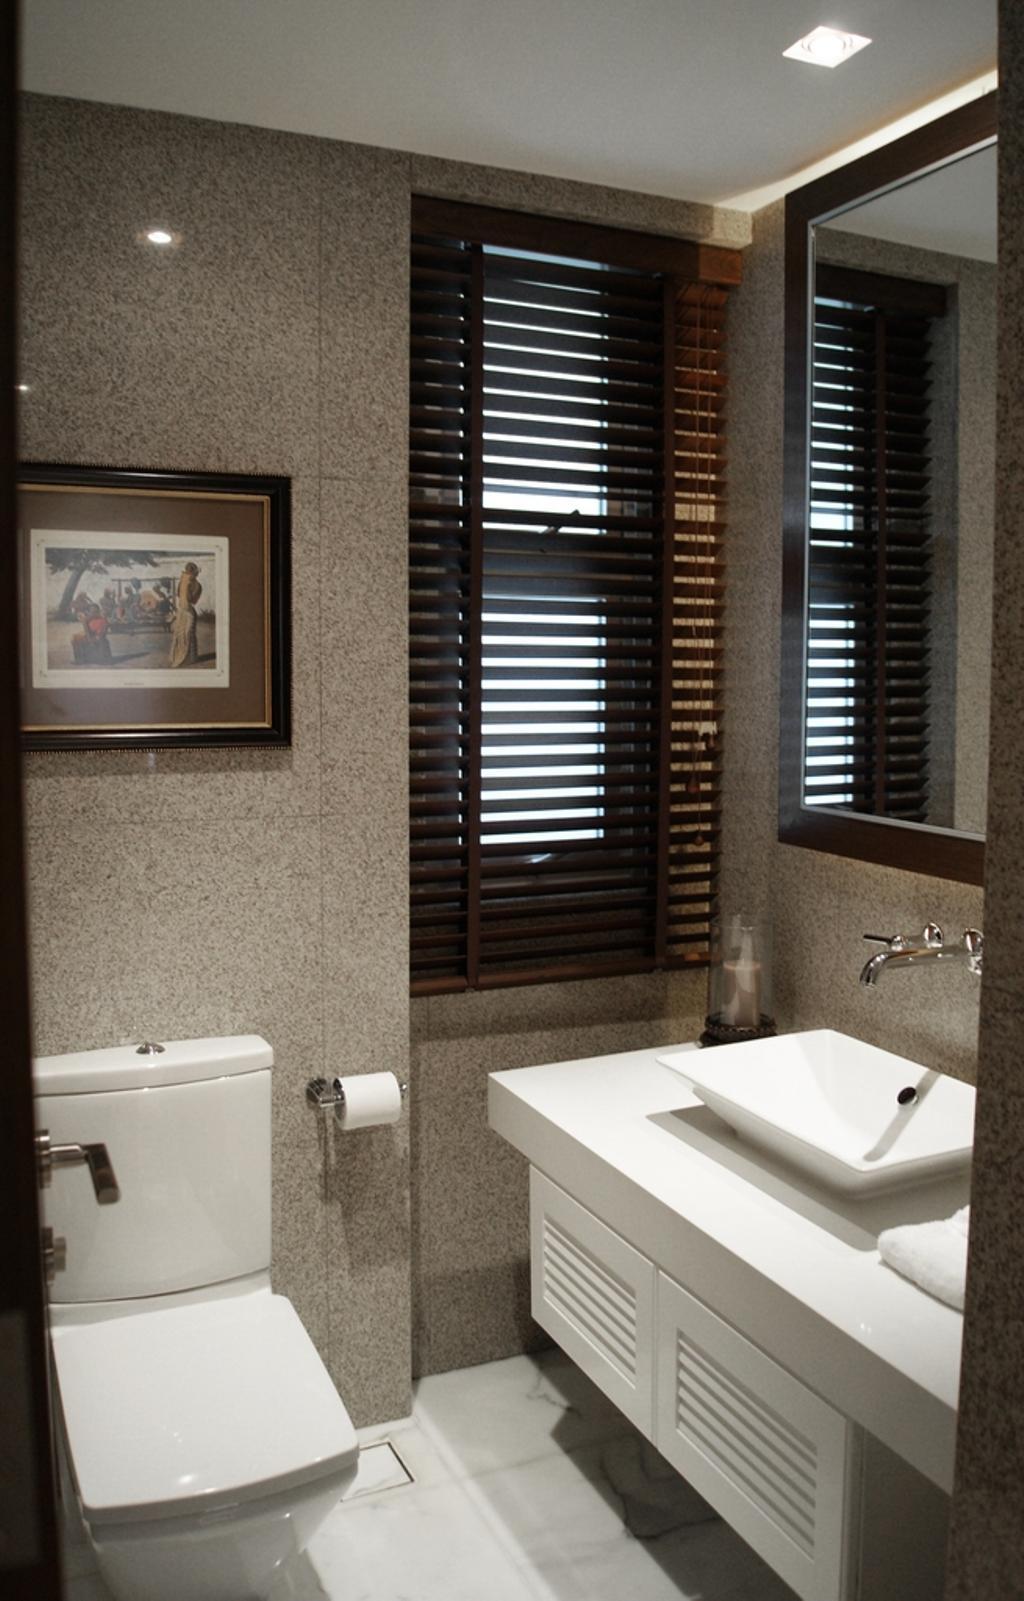 Transitional, Condo, Bathroom, The Levelz, Interior Designer, Metamorph Design, Blinds, Bathroom Tiles, Indoors, Interior Design, Room, Art, Painting